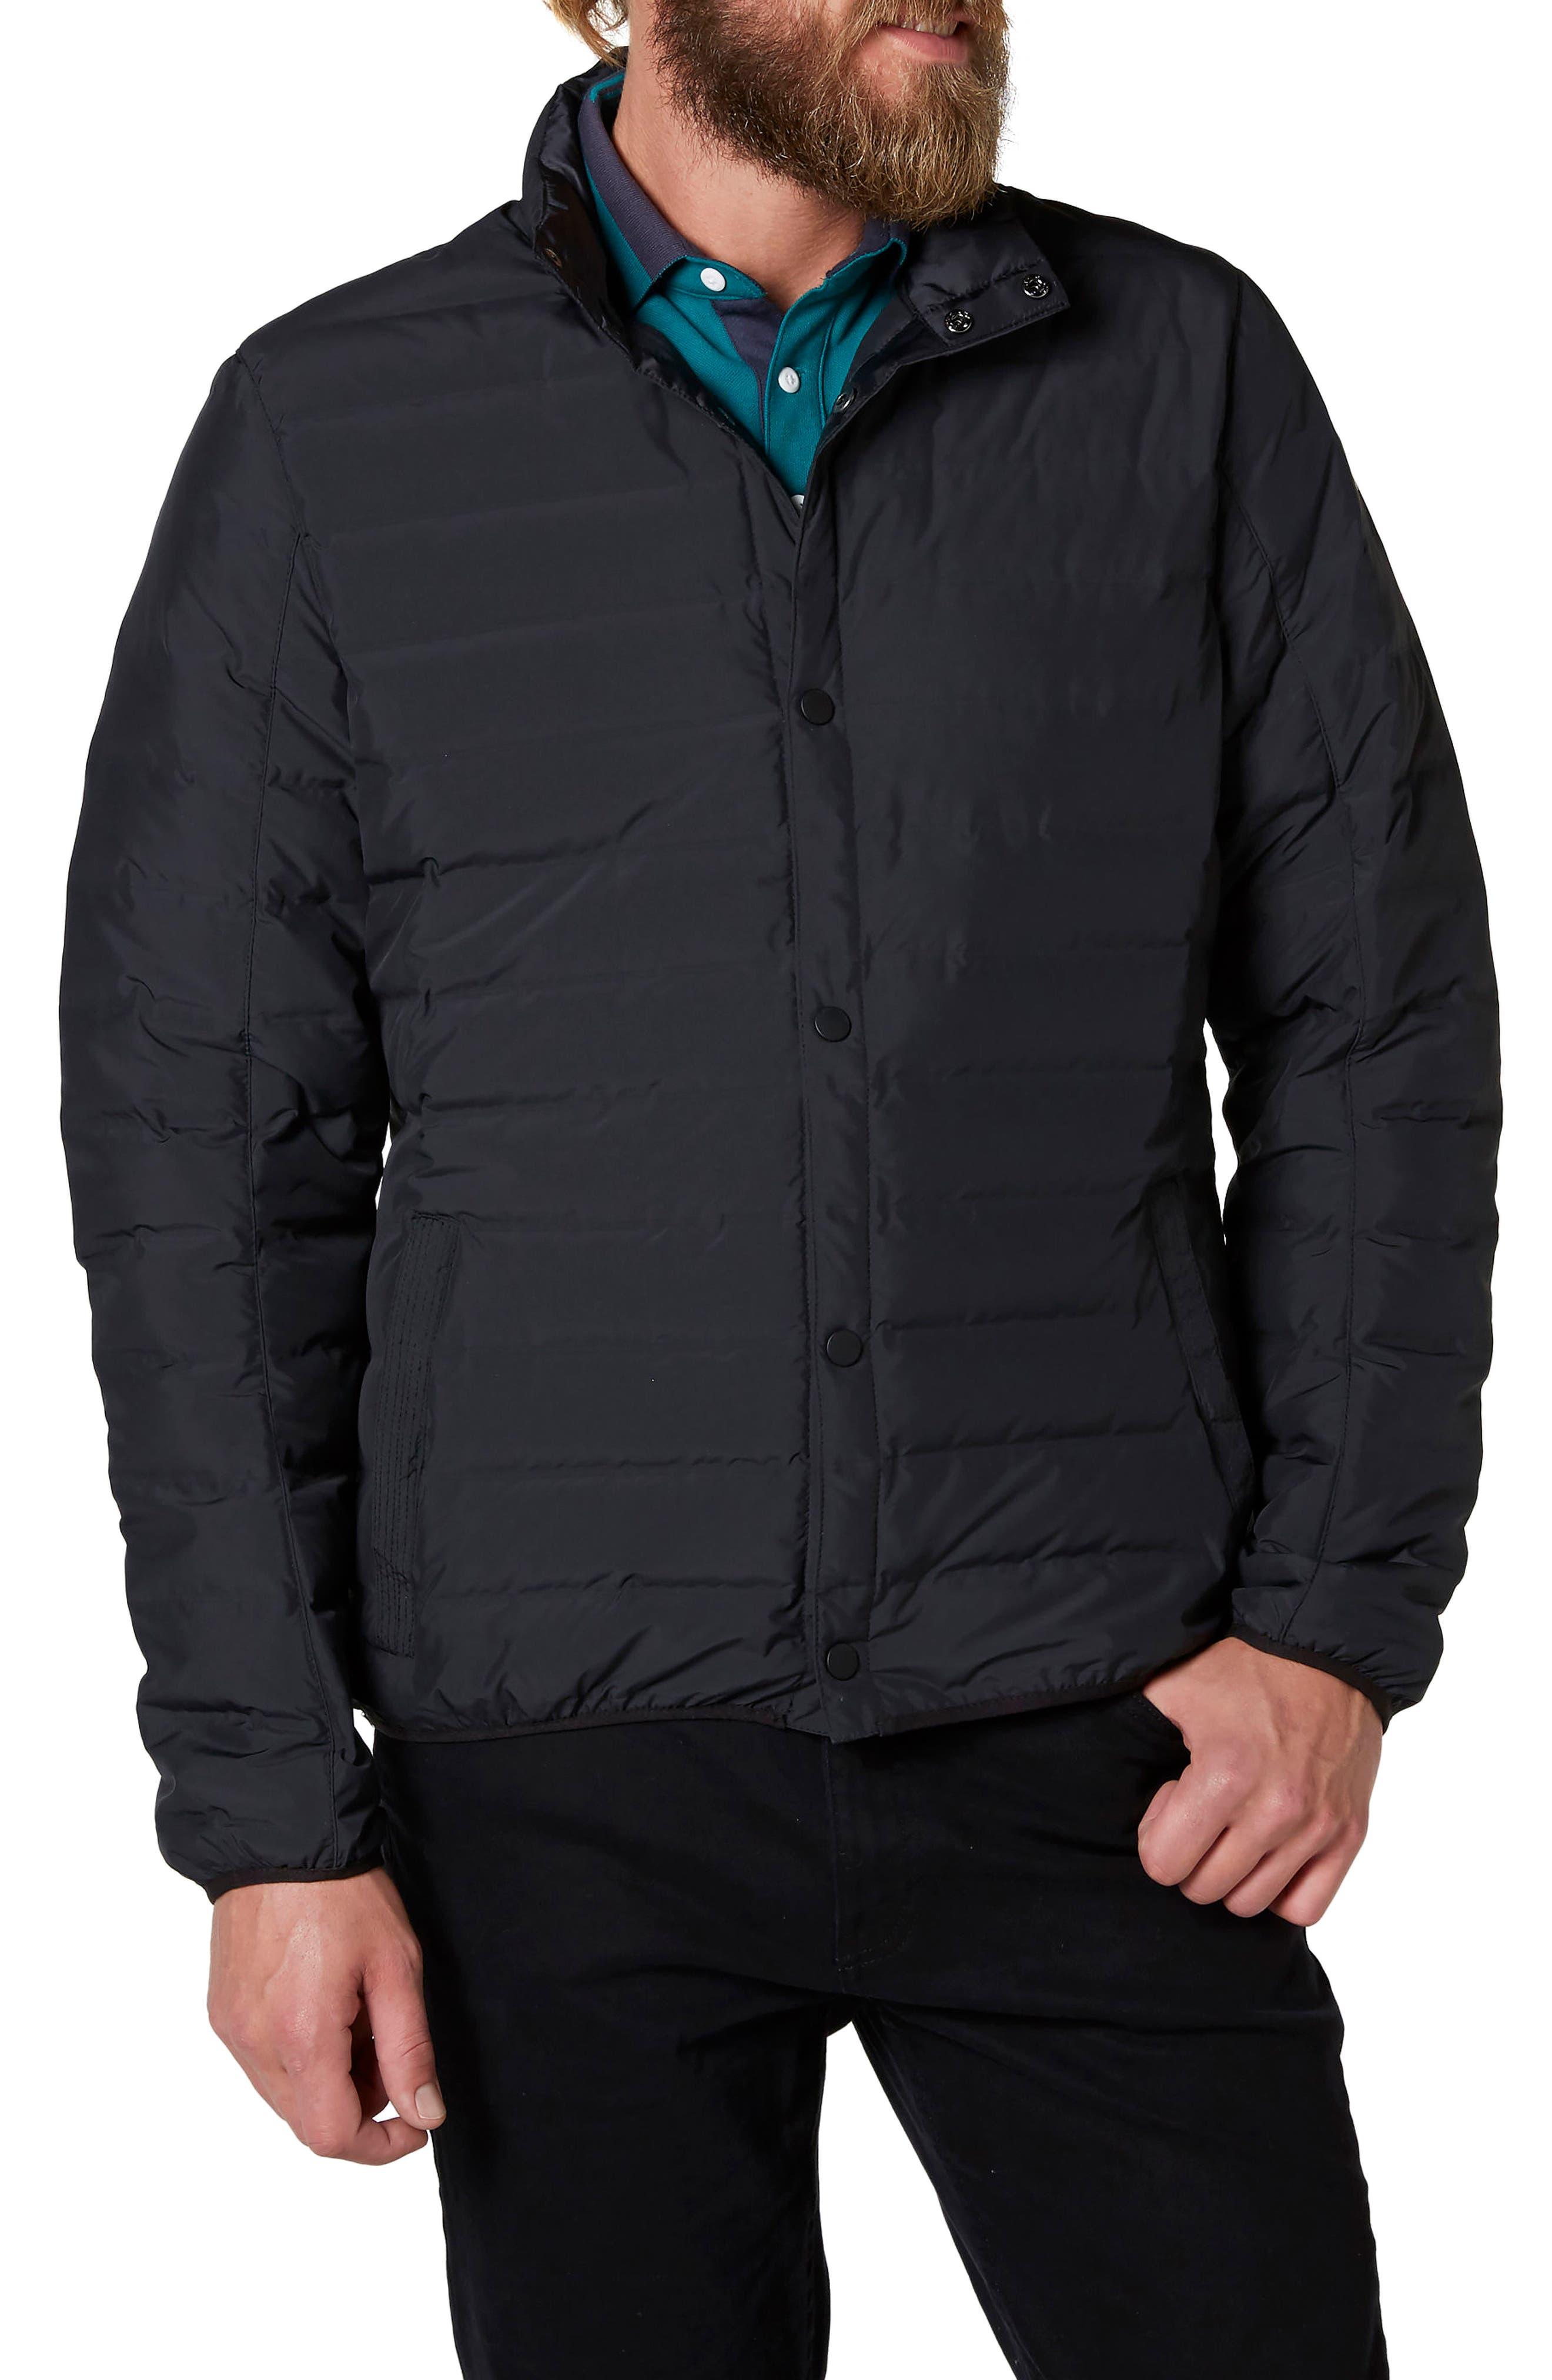 Urban Liner Jacket,                         Main,                         color, 001